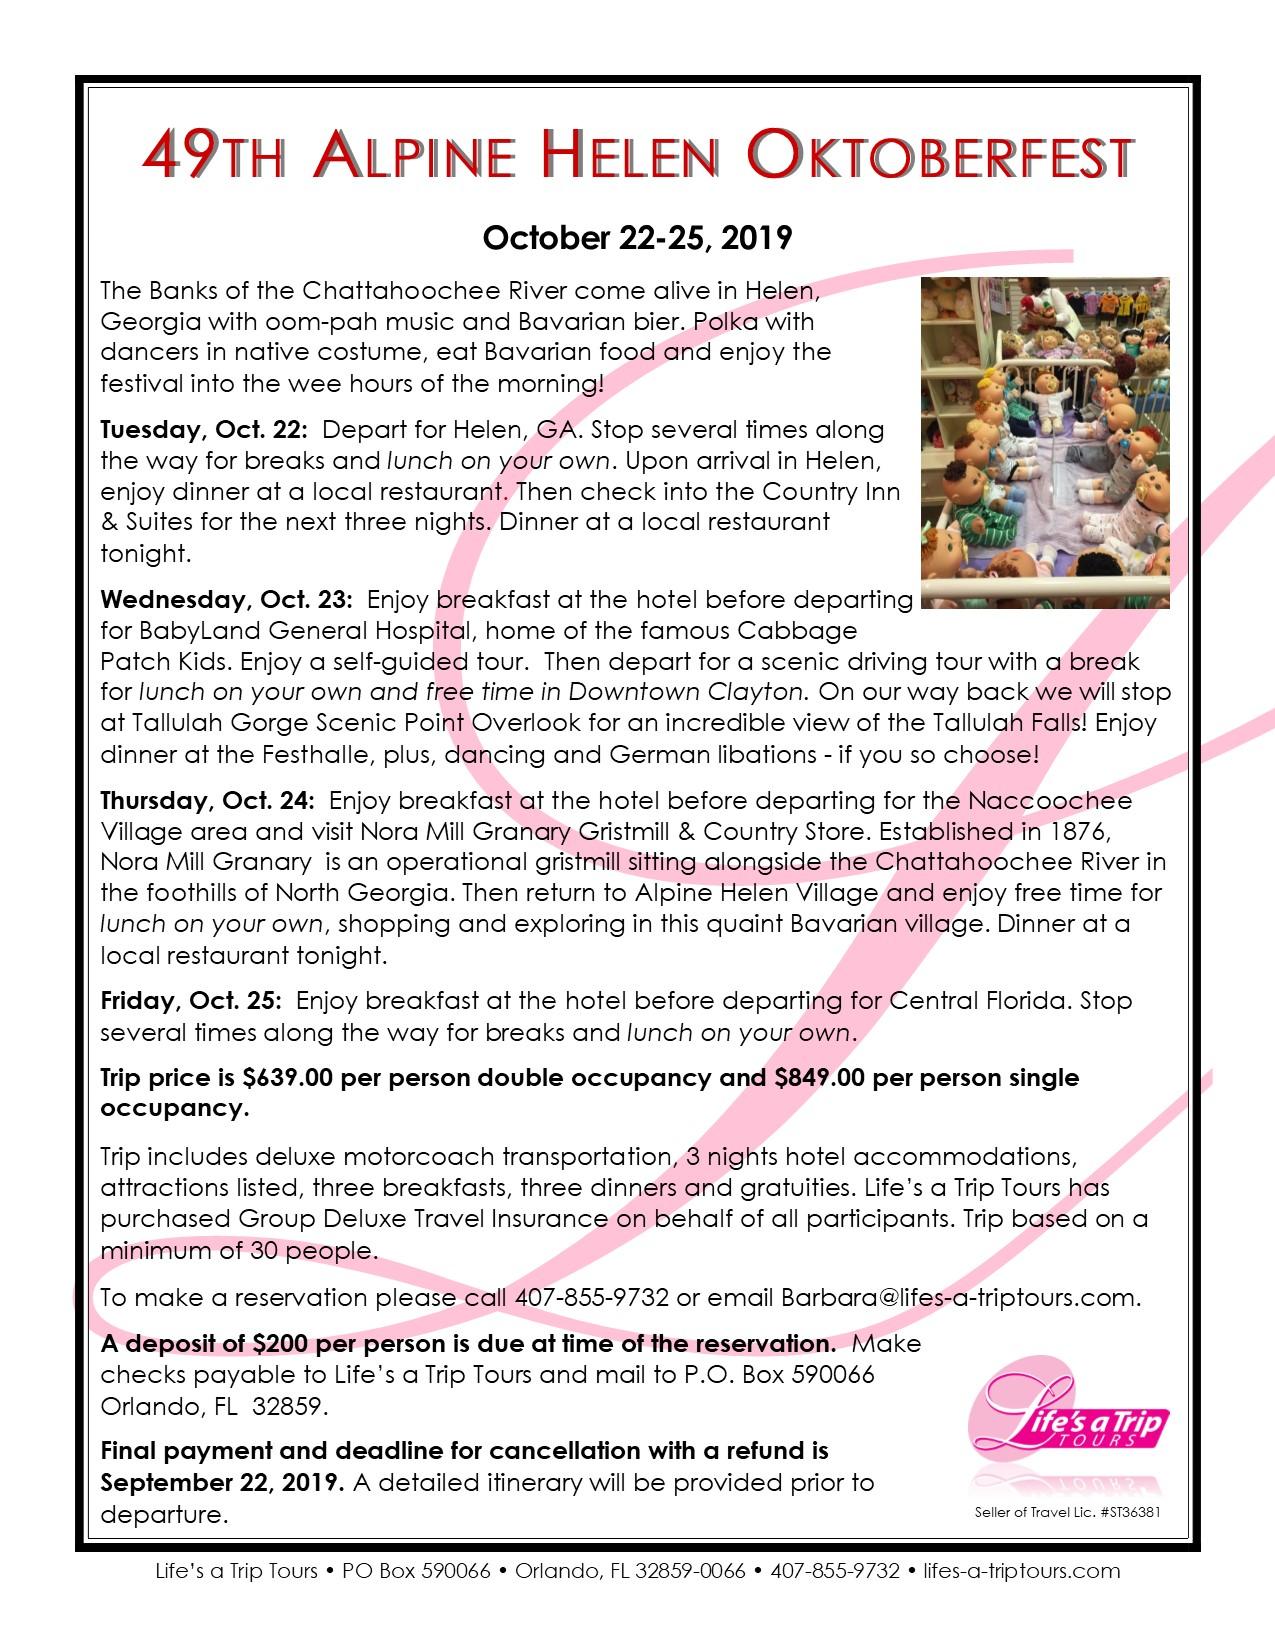 49th Alpine Helen Oktoberfest